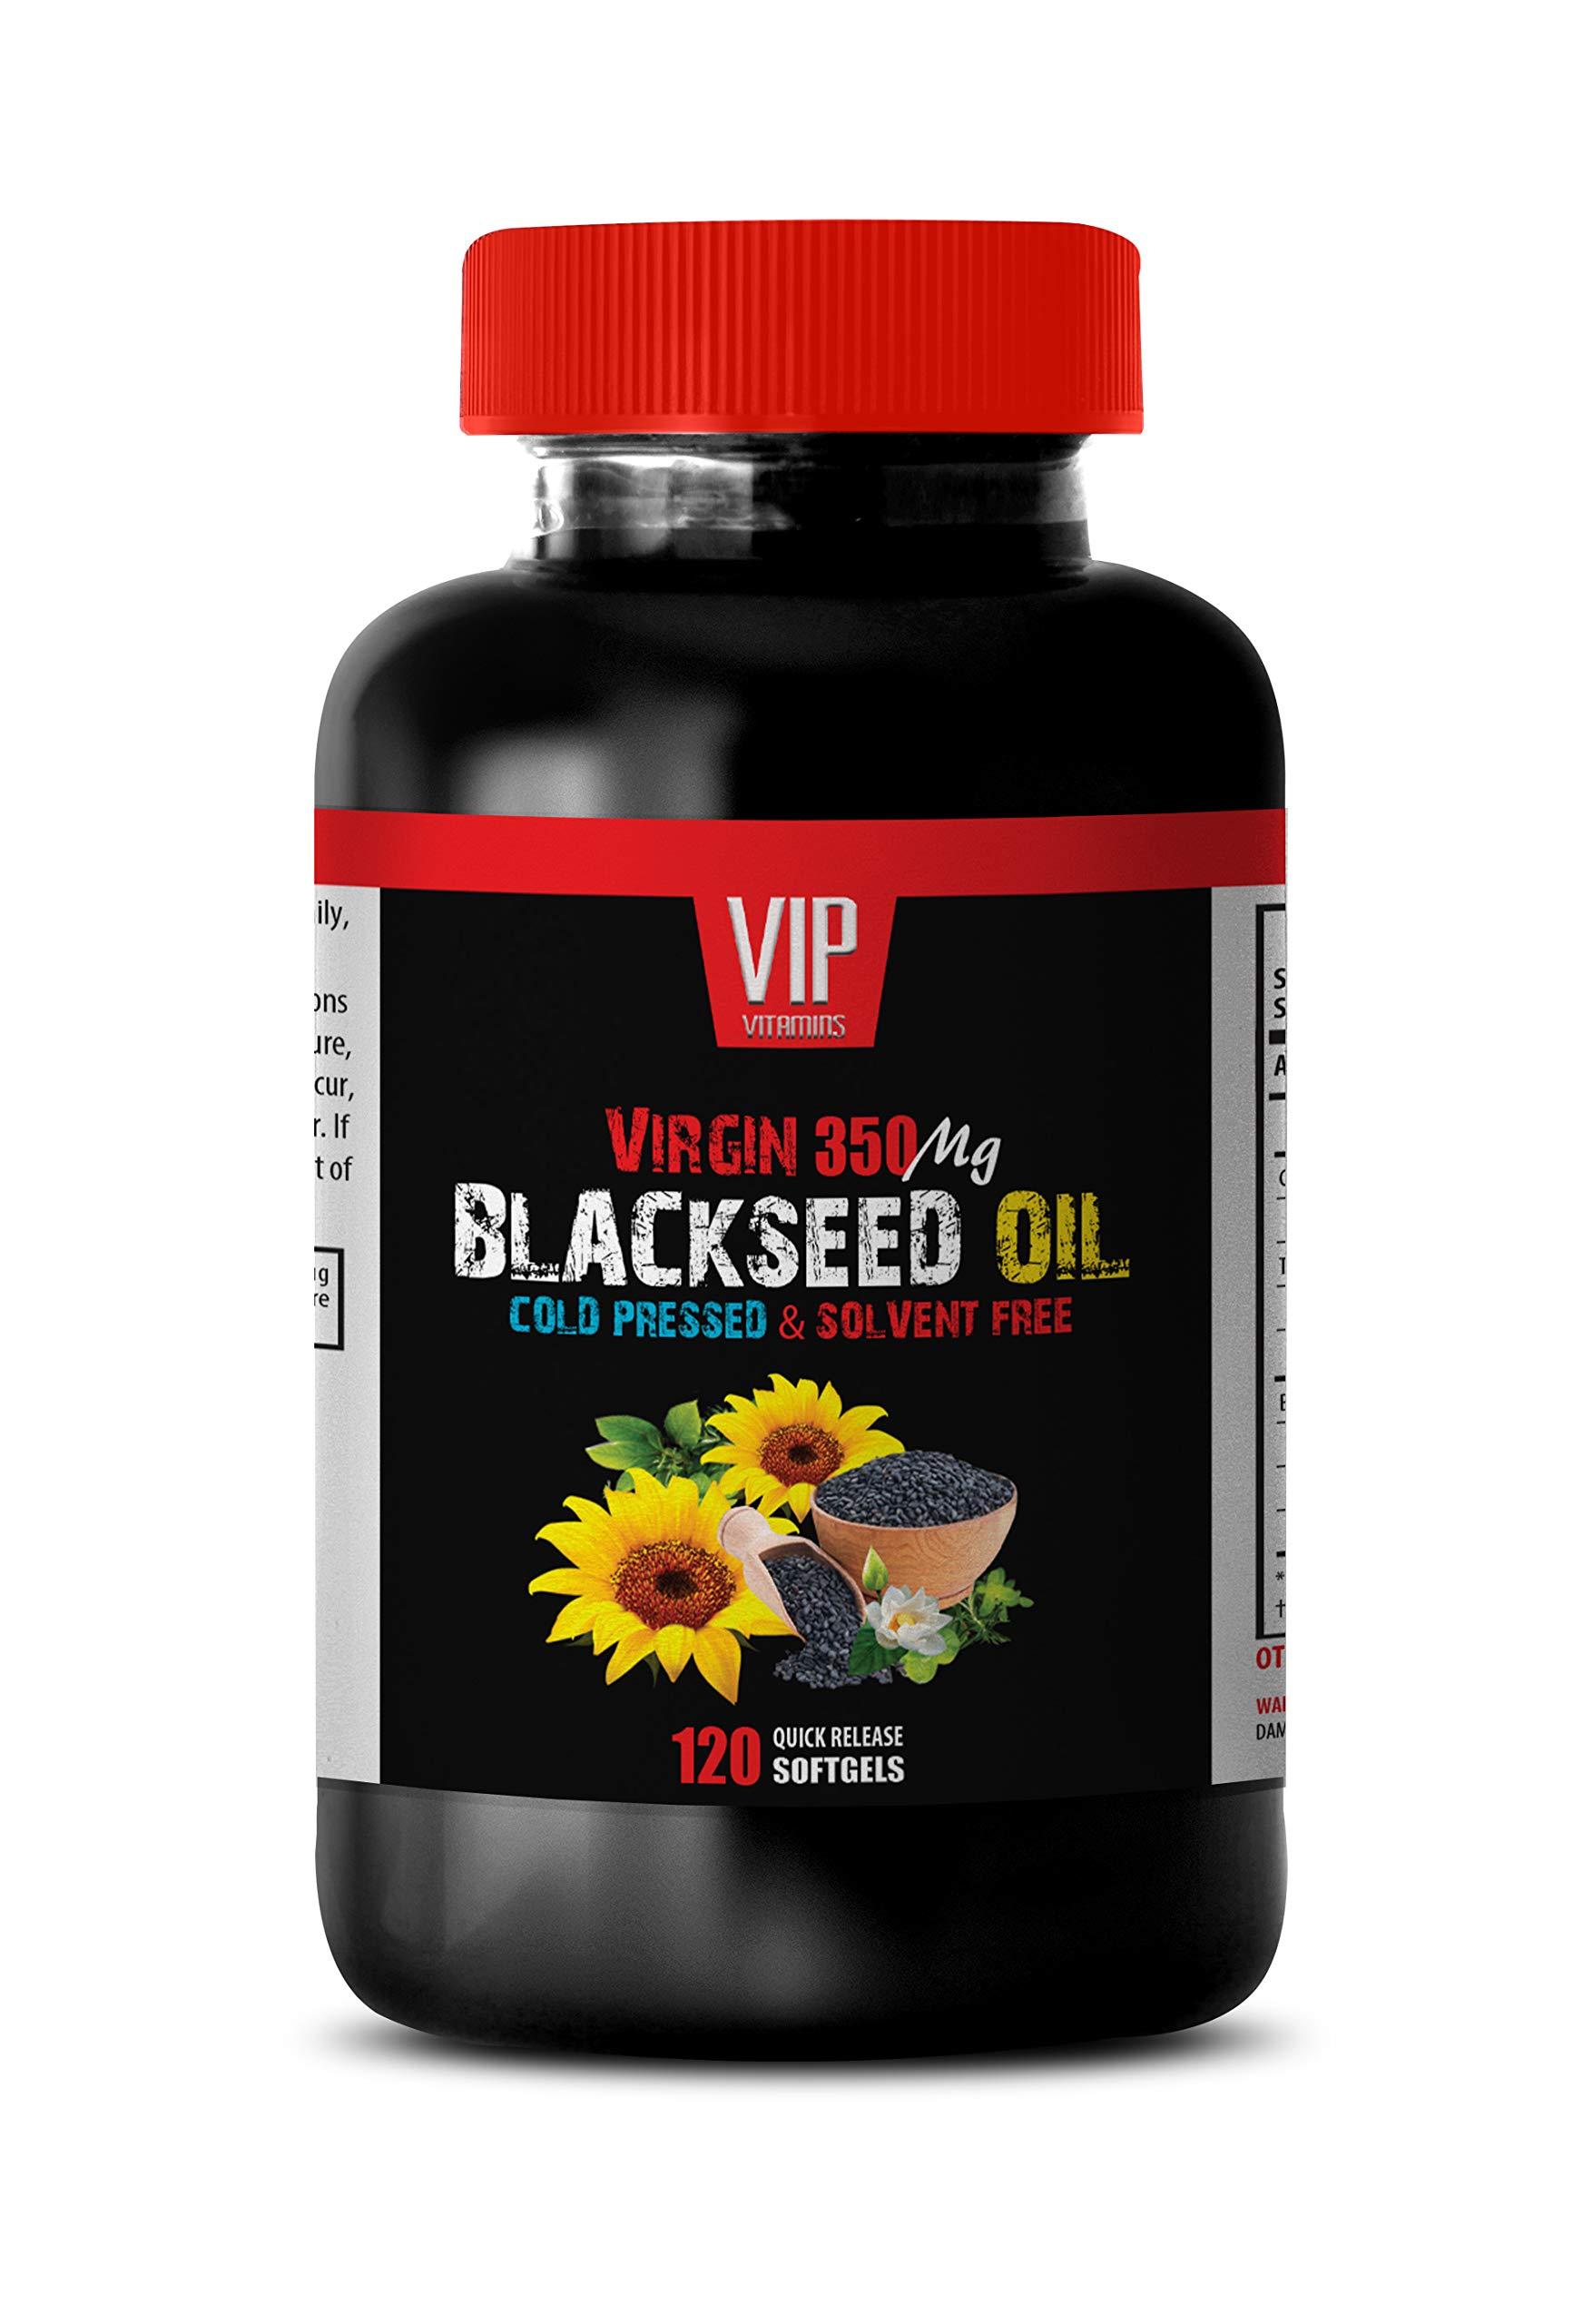 Antibacterial Supplements - Black Seed Oil Virgin 350 MG - Black Seed Oil raw Cold Pressed - 1 Bottle 120 Softgels by VIP VITAMINS